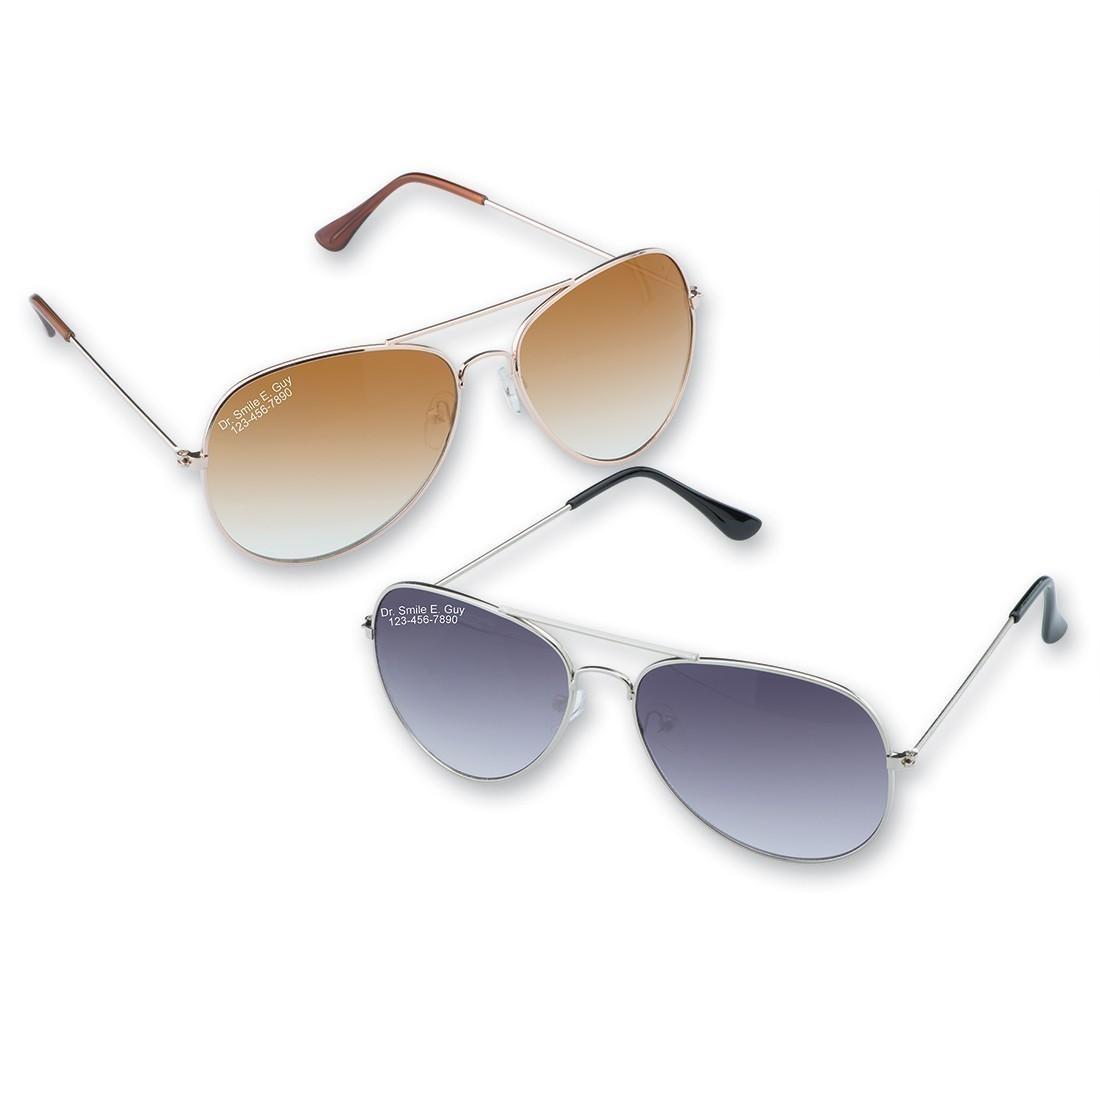 0812885a07 Custom Adult Aviator Sunglasses - Custom Sunglasses from SmileMakers